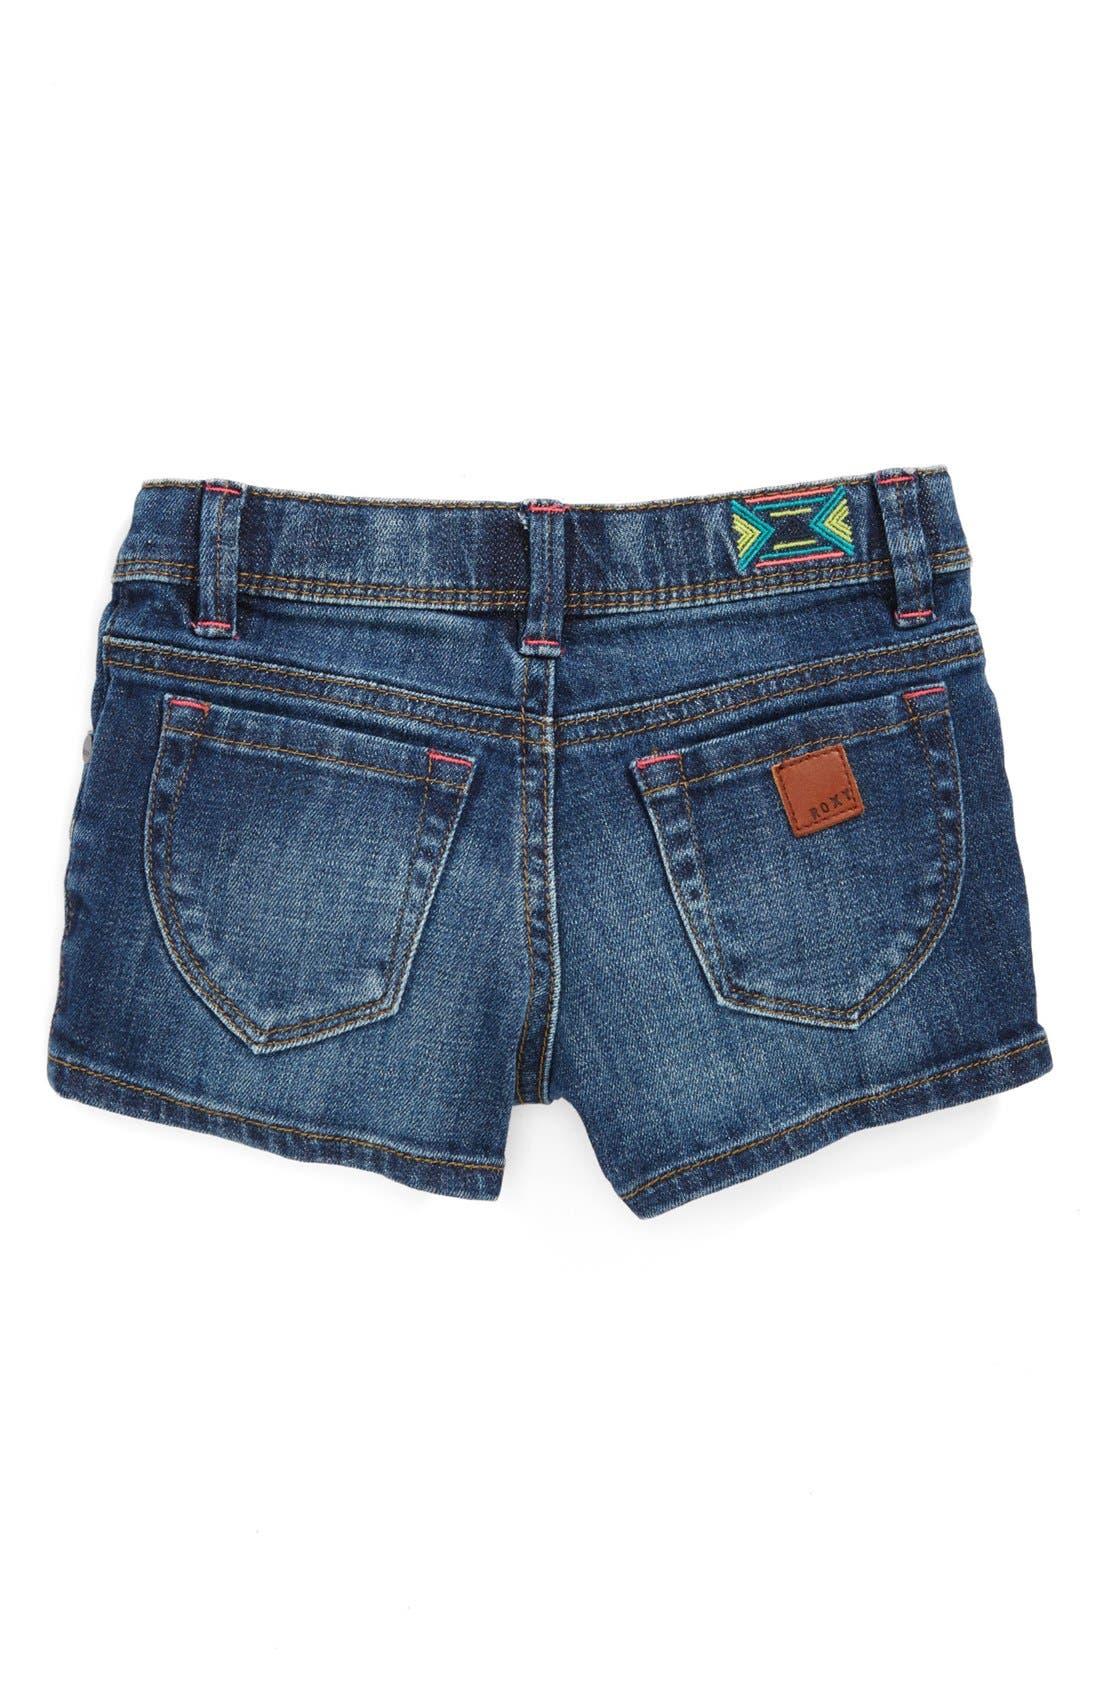 'Lisy' Shorts,                             Alternate thumbnail 2, color,